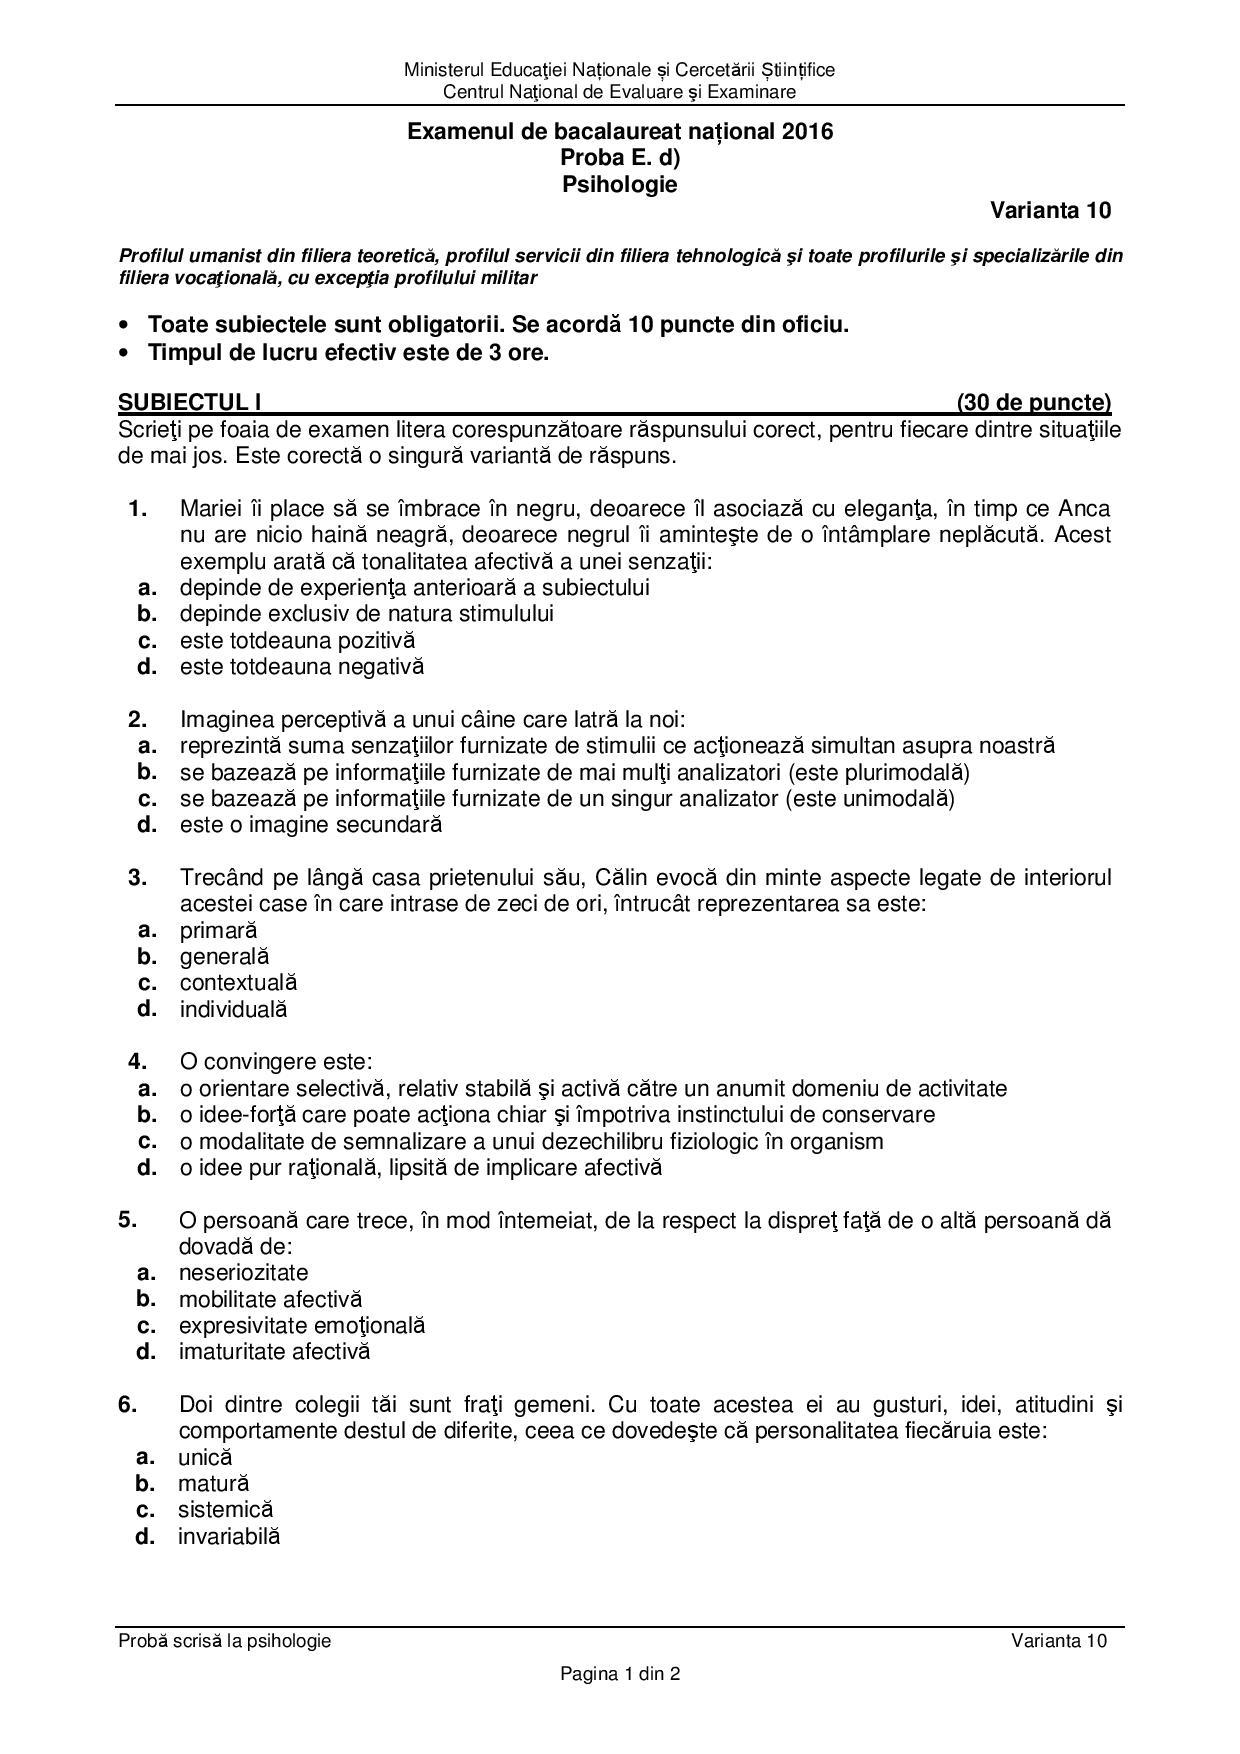 E_d_psihologie_2016_var_10_LRO-page-001